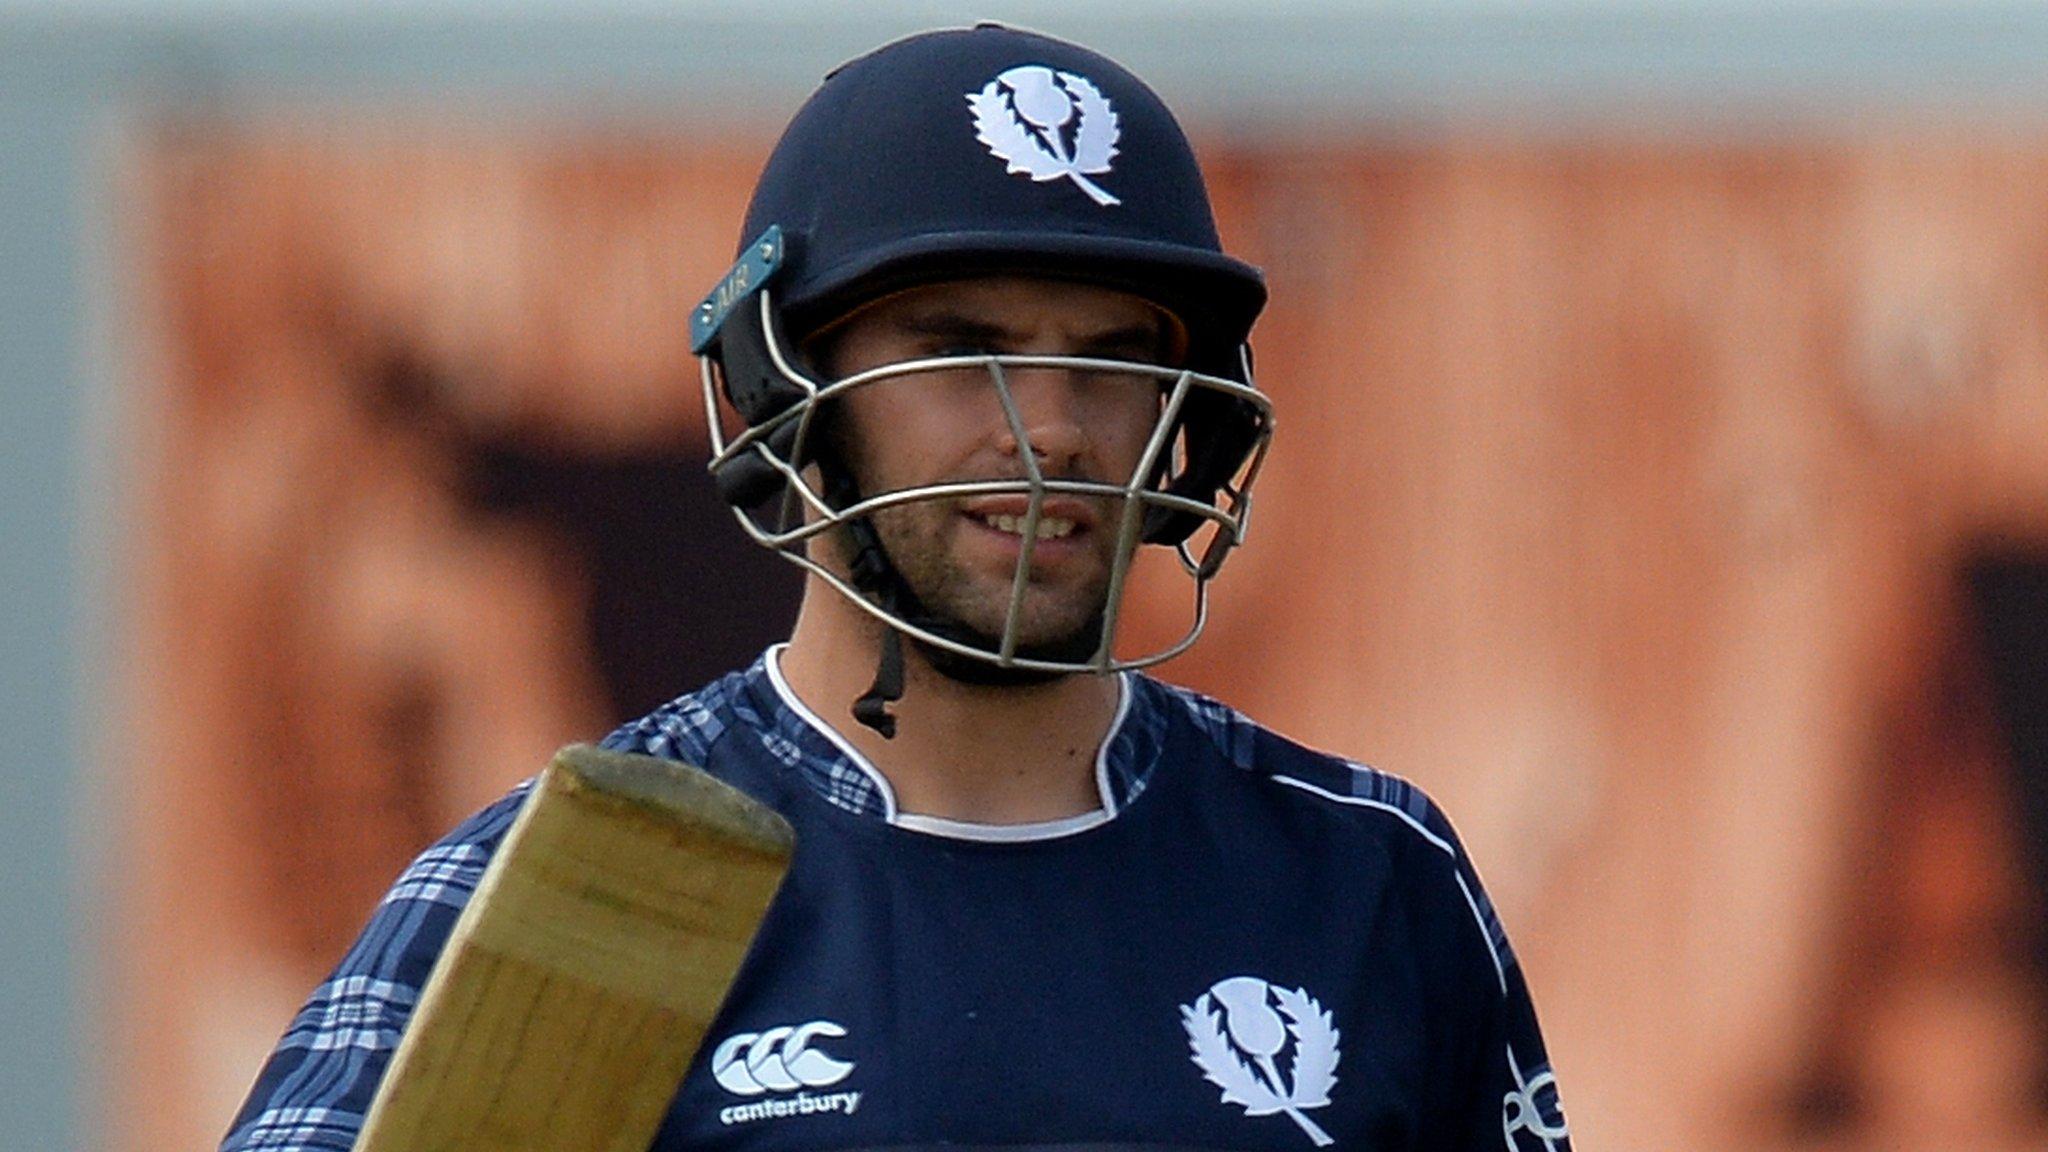 T20 Quadrangular Series: Coetzer's 74 helps Scotland beat Ireland by six wickets